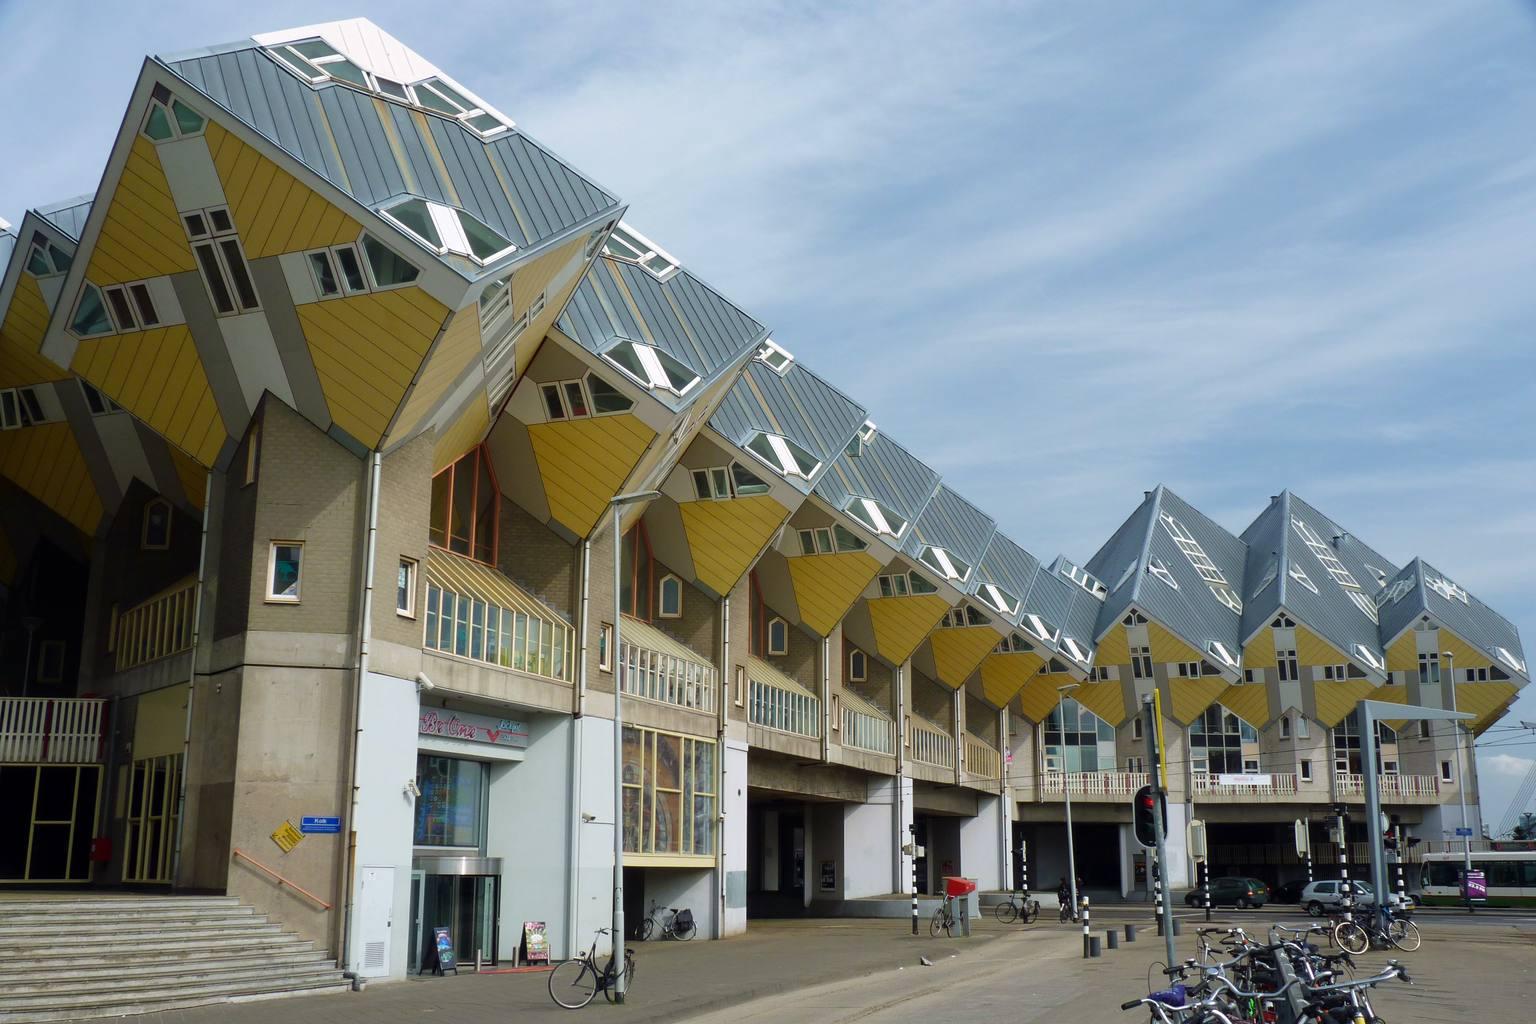 Rotterdam_Cube_House_street_view.jpg